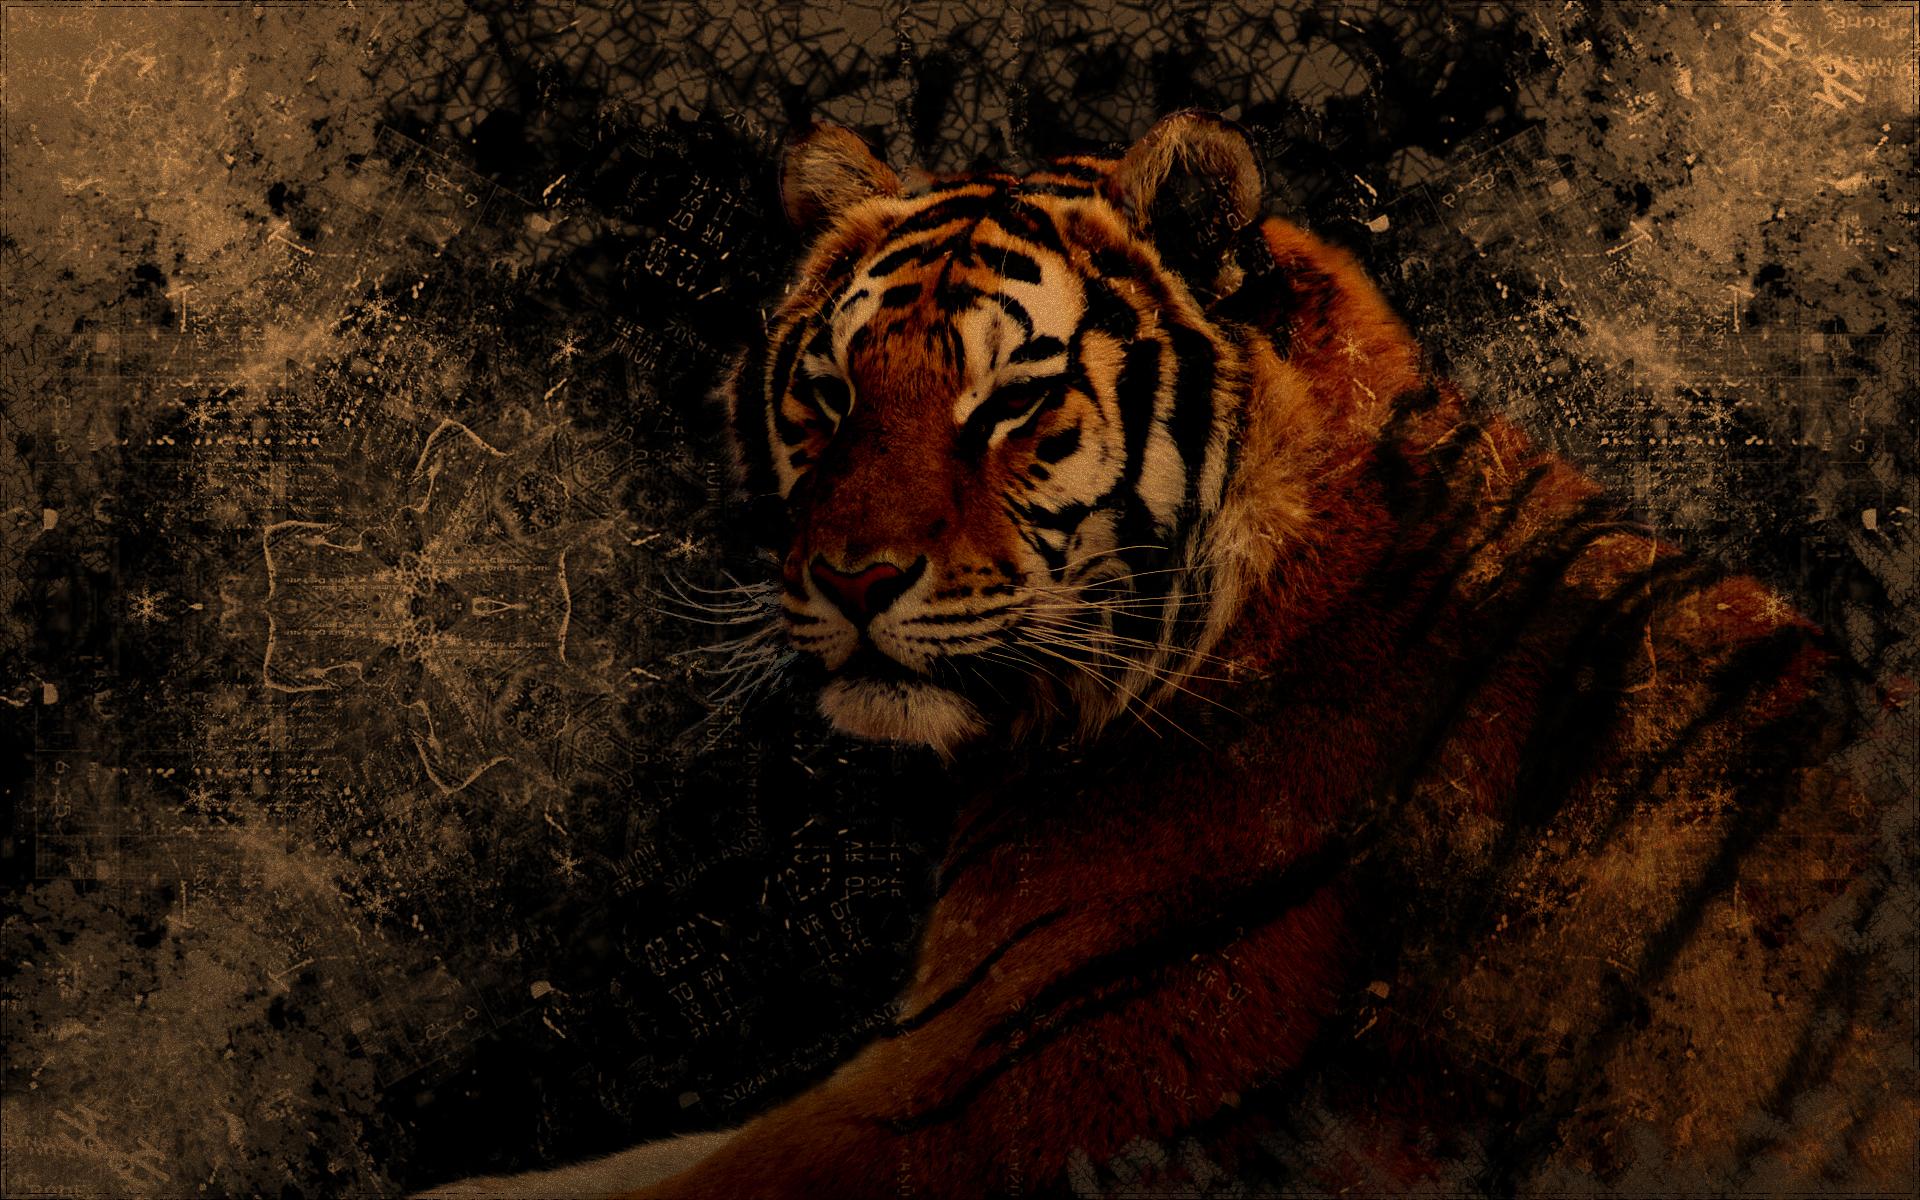 Tiger tumblr wallpaper